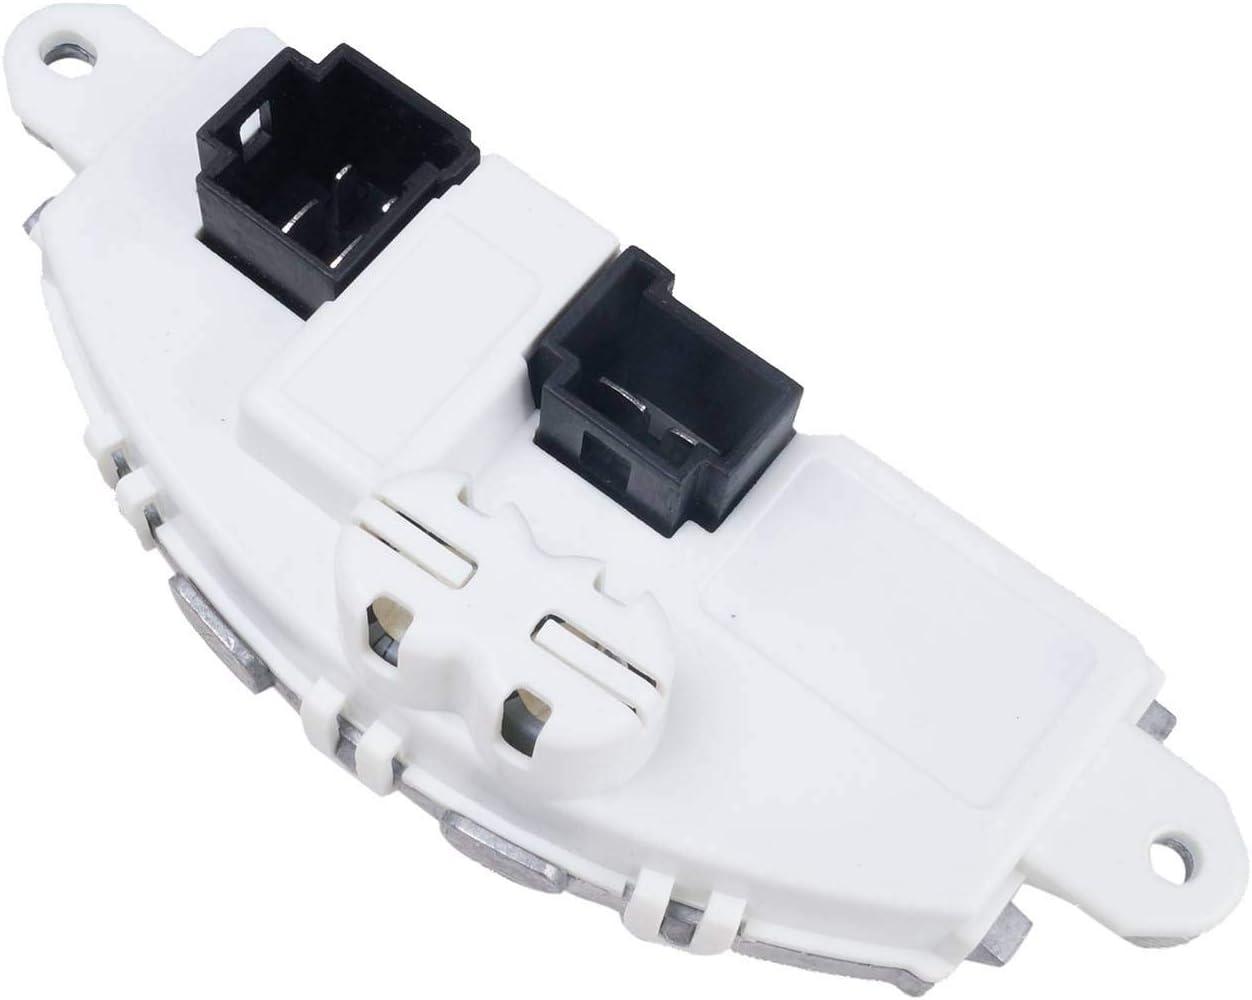 A//C Blower Motor Resistor Control Unit for Mercedes GL350 GL450 ML350 1669064001